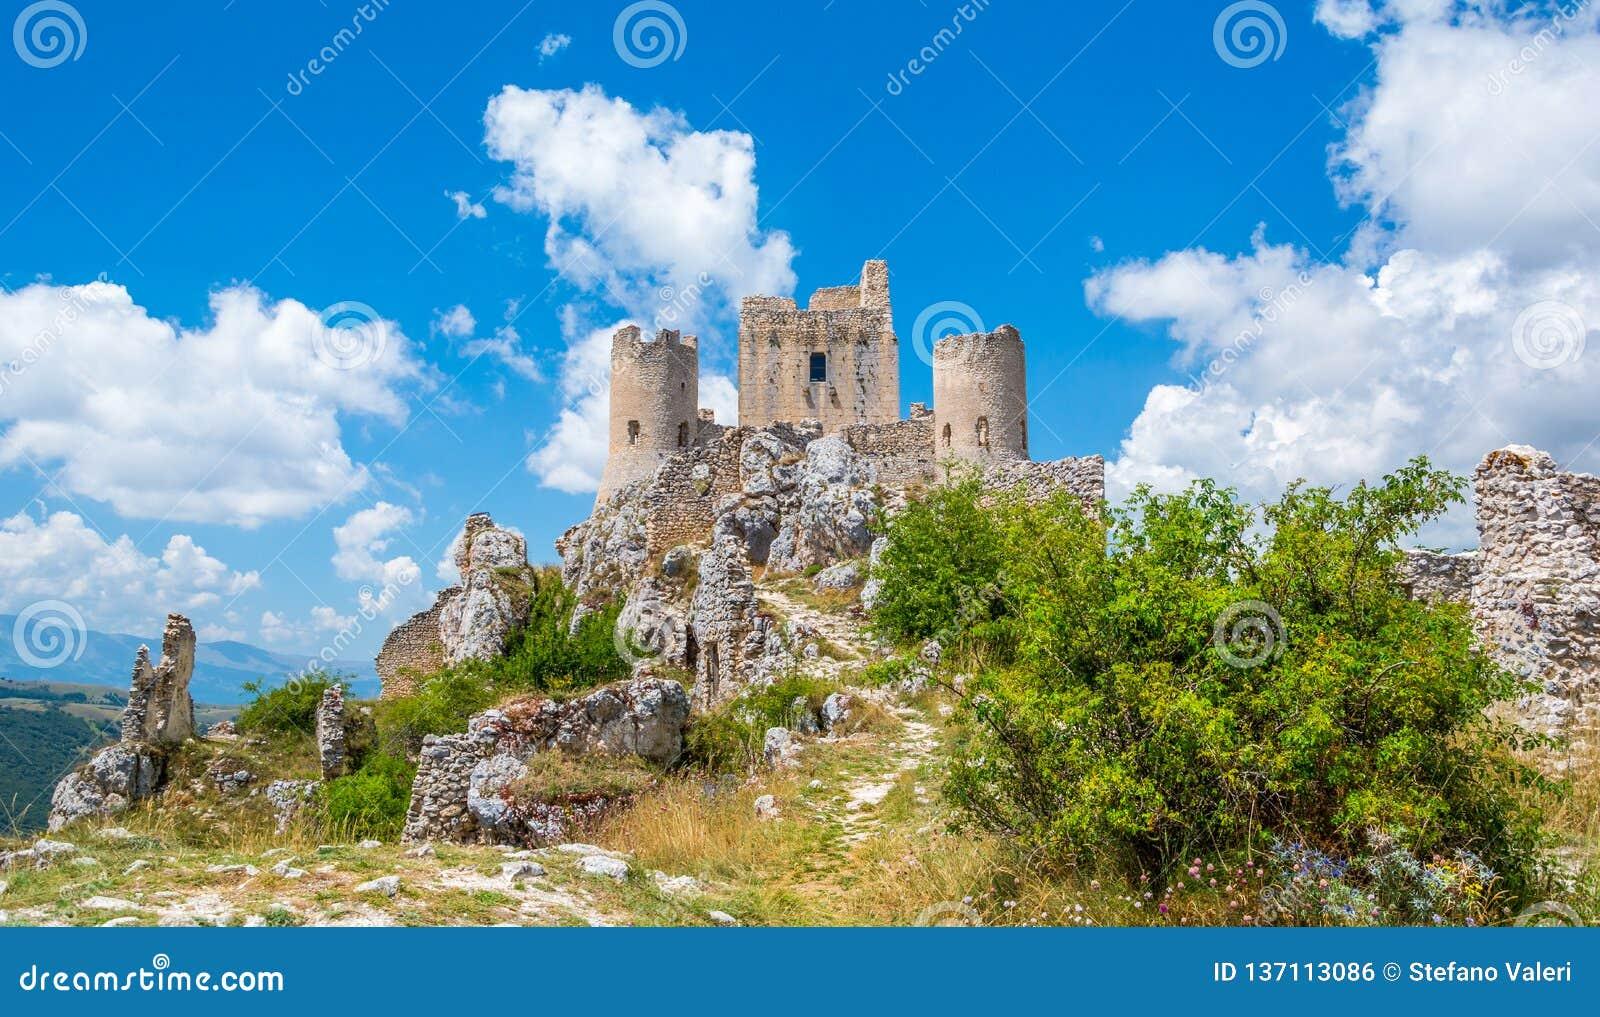 Rocca Calascio, mountaintop fortress or rocca in the Province of L`Aquila in Abruzzo, Italy.